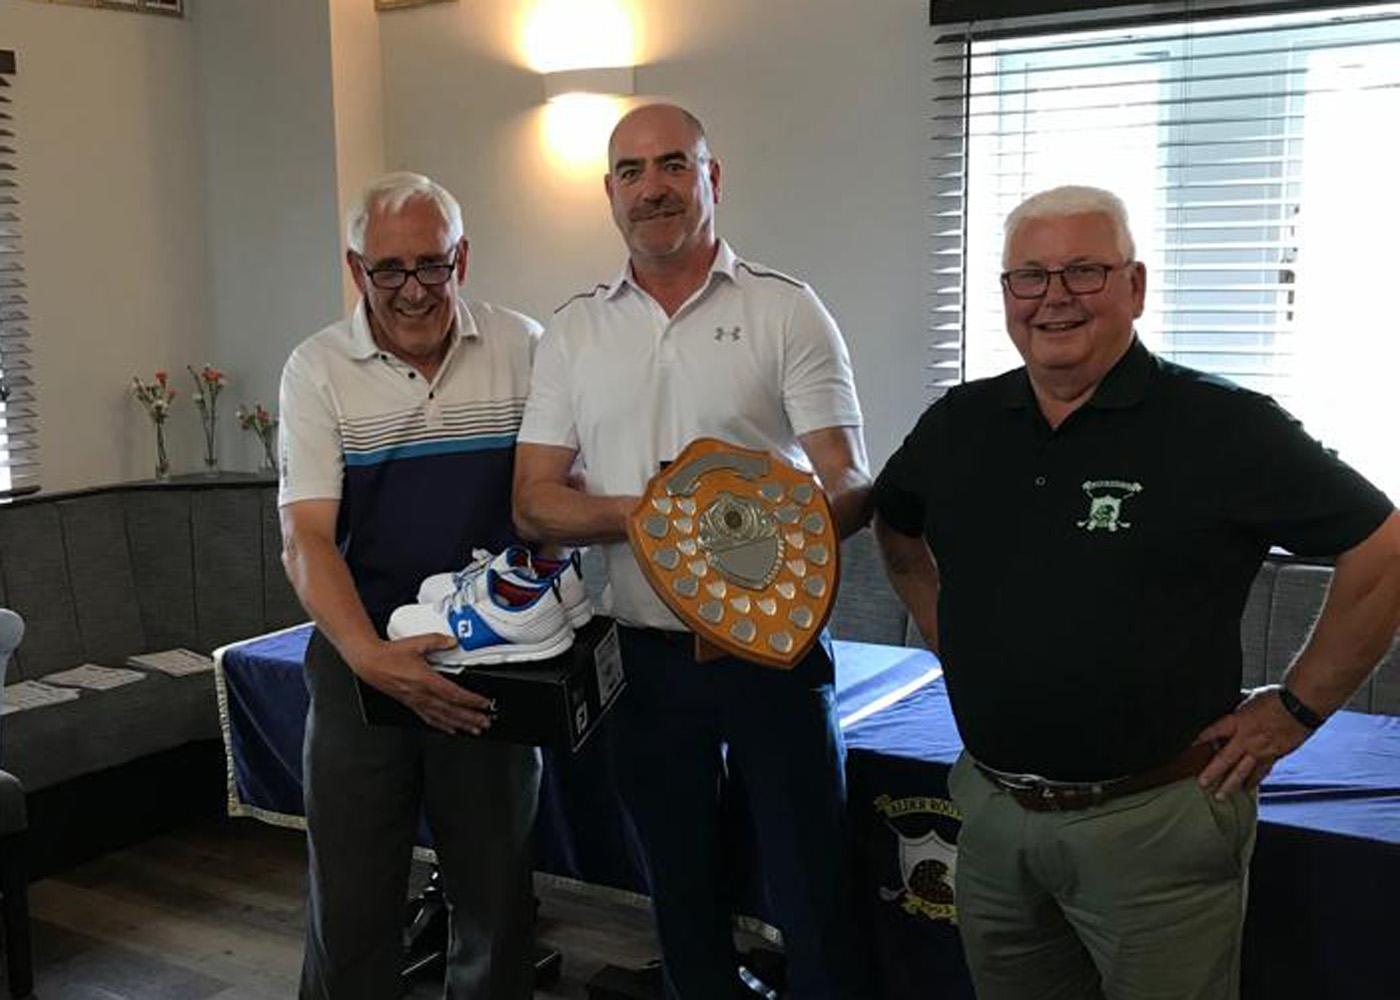 Club Championship - 20/21st July 2019